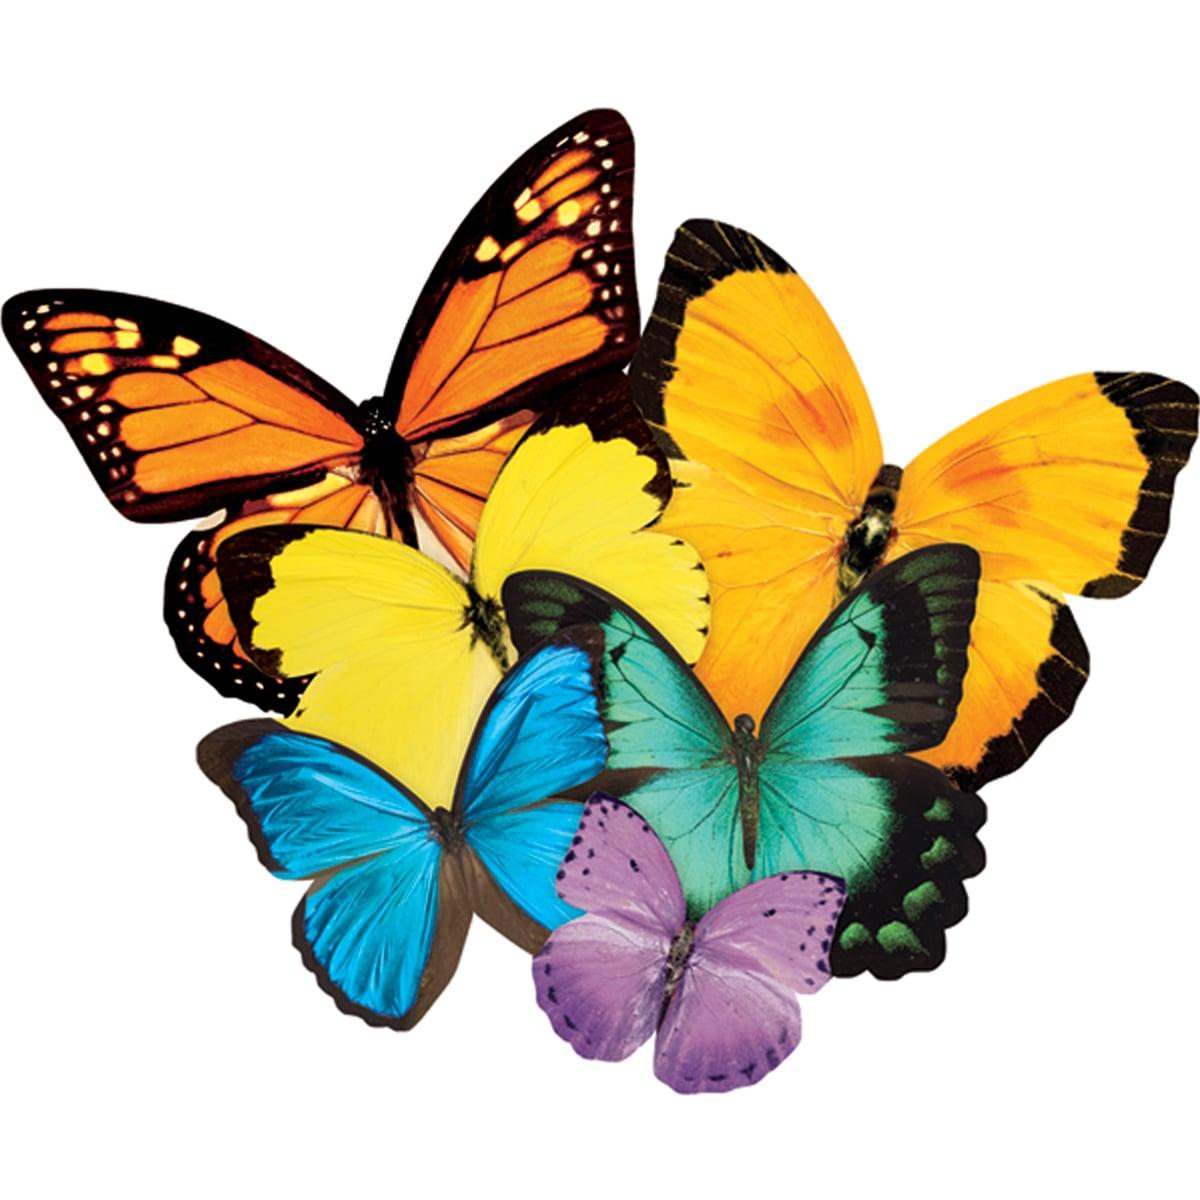 Paper House Butterflies 500-piece Jigsaw Shaped Puzzle